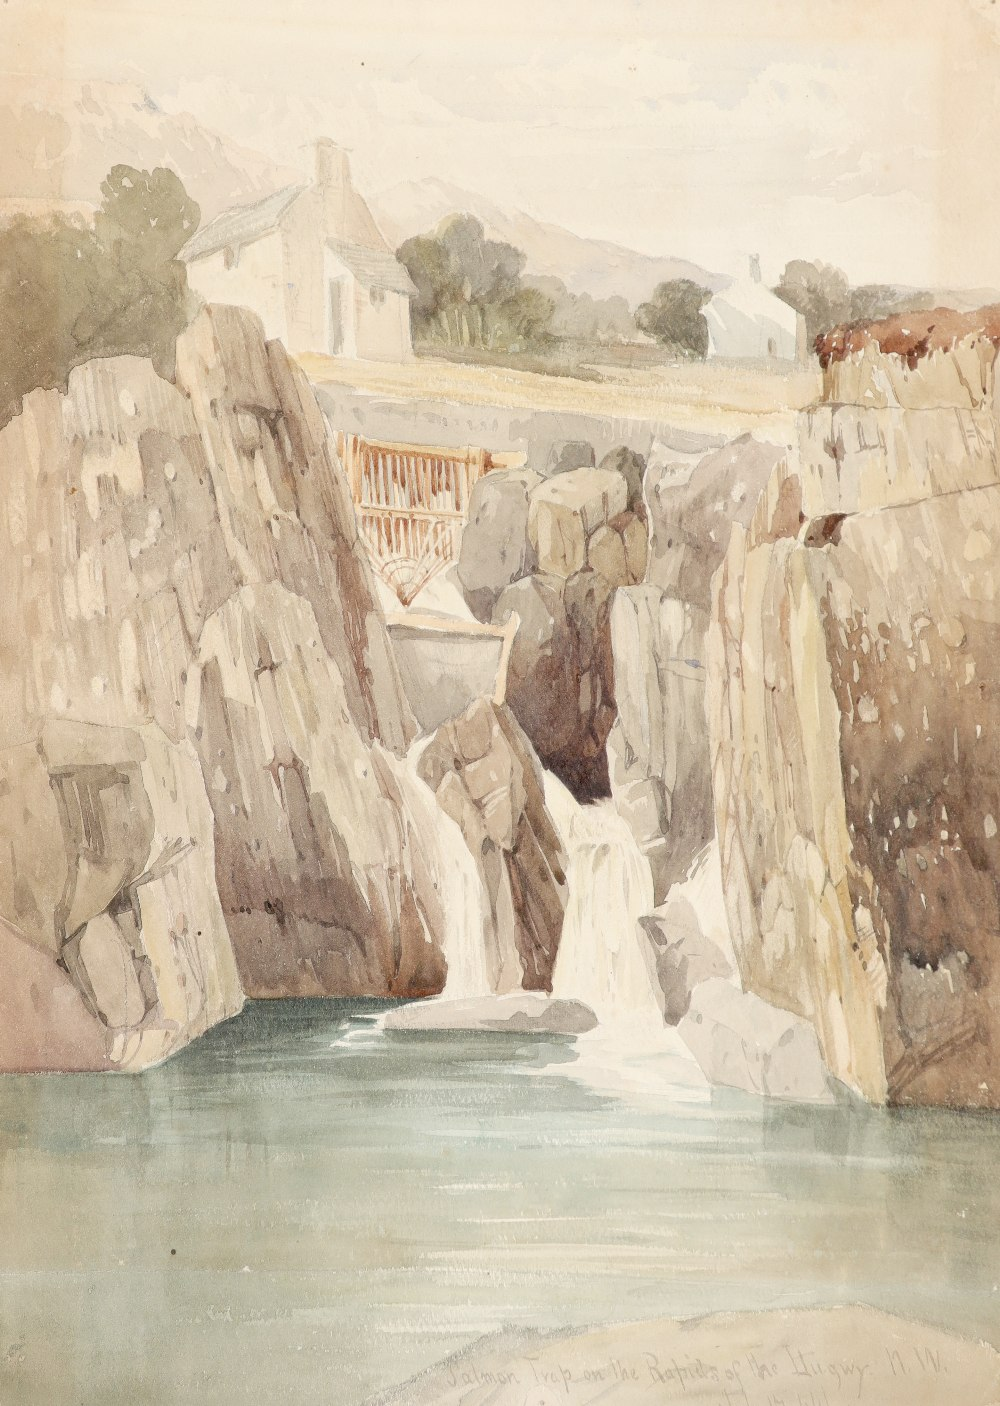 Harry John Johnson (1826-1884) Salmon trap on the rapids of the Llugwy, North Wales; Landscape